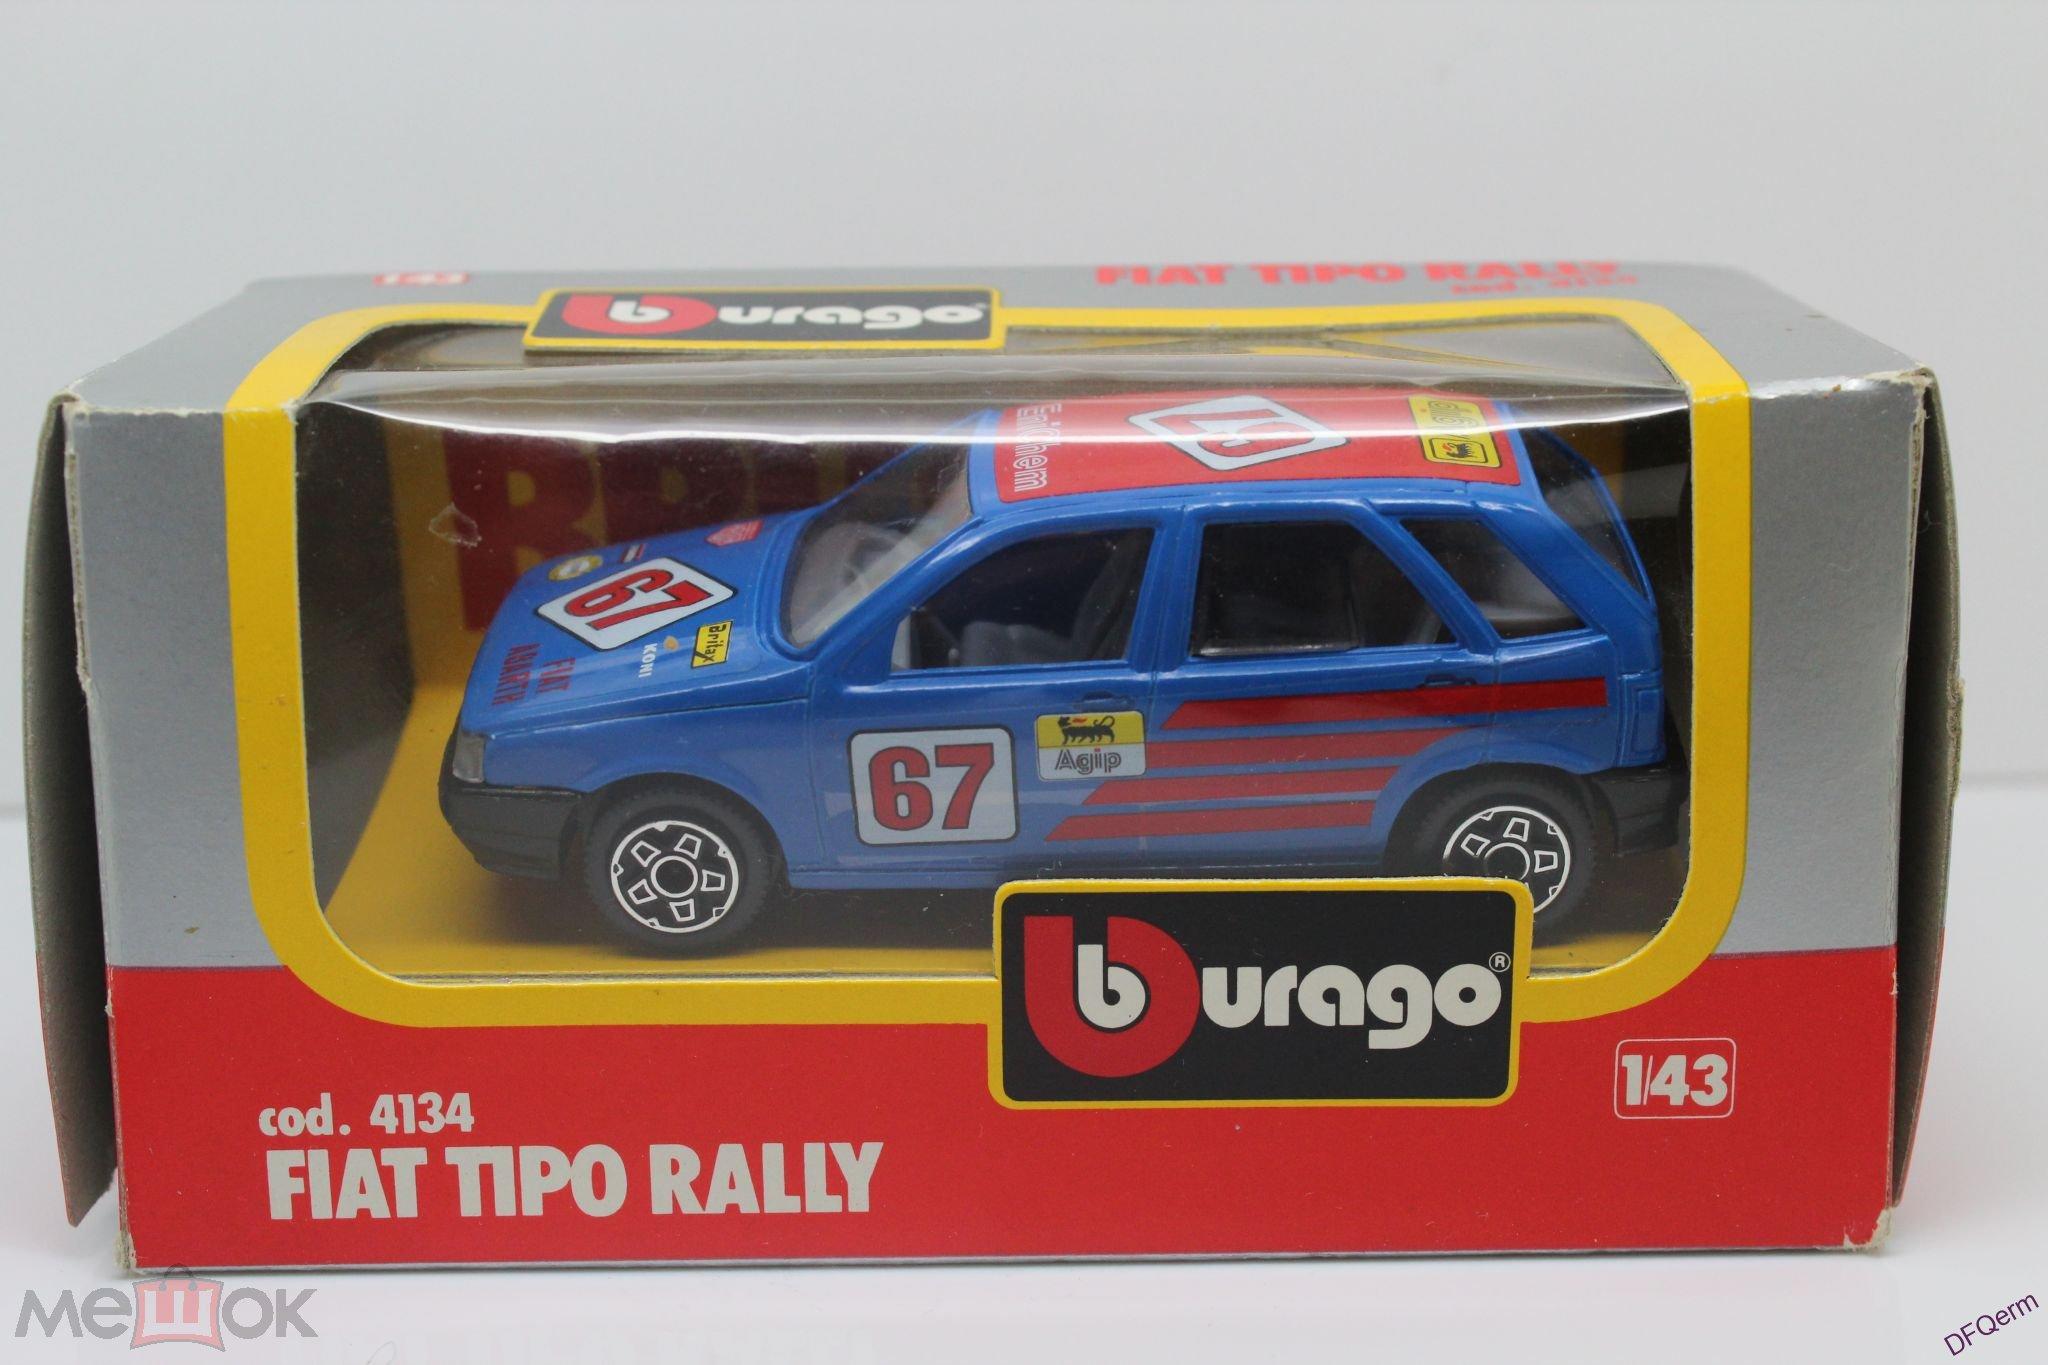 Rasprodazha Model 1 43 Igrushka Fiat Tipo Rally V Ideale Burago